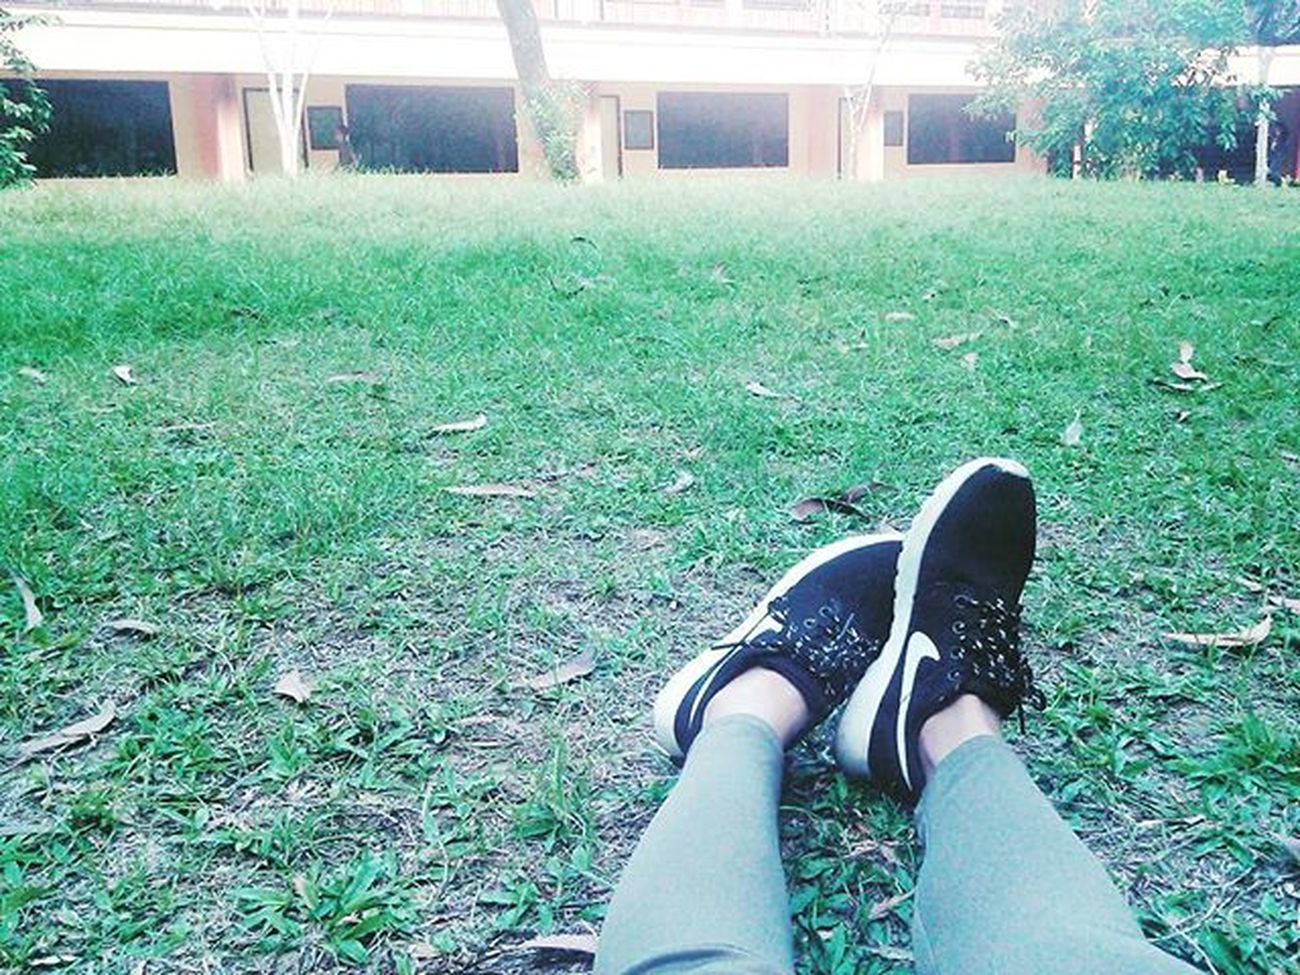 Kapoy maghulat tawagun lng imong ngalan ✘✘ @Cass Enrollment Yopak